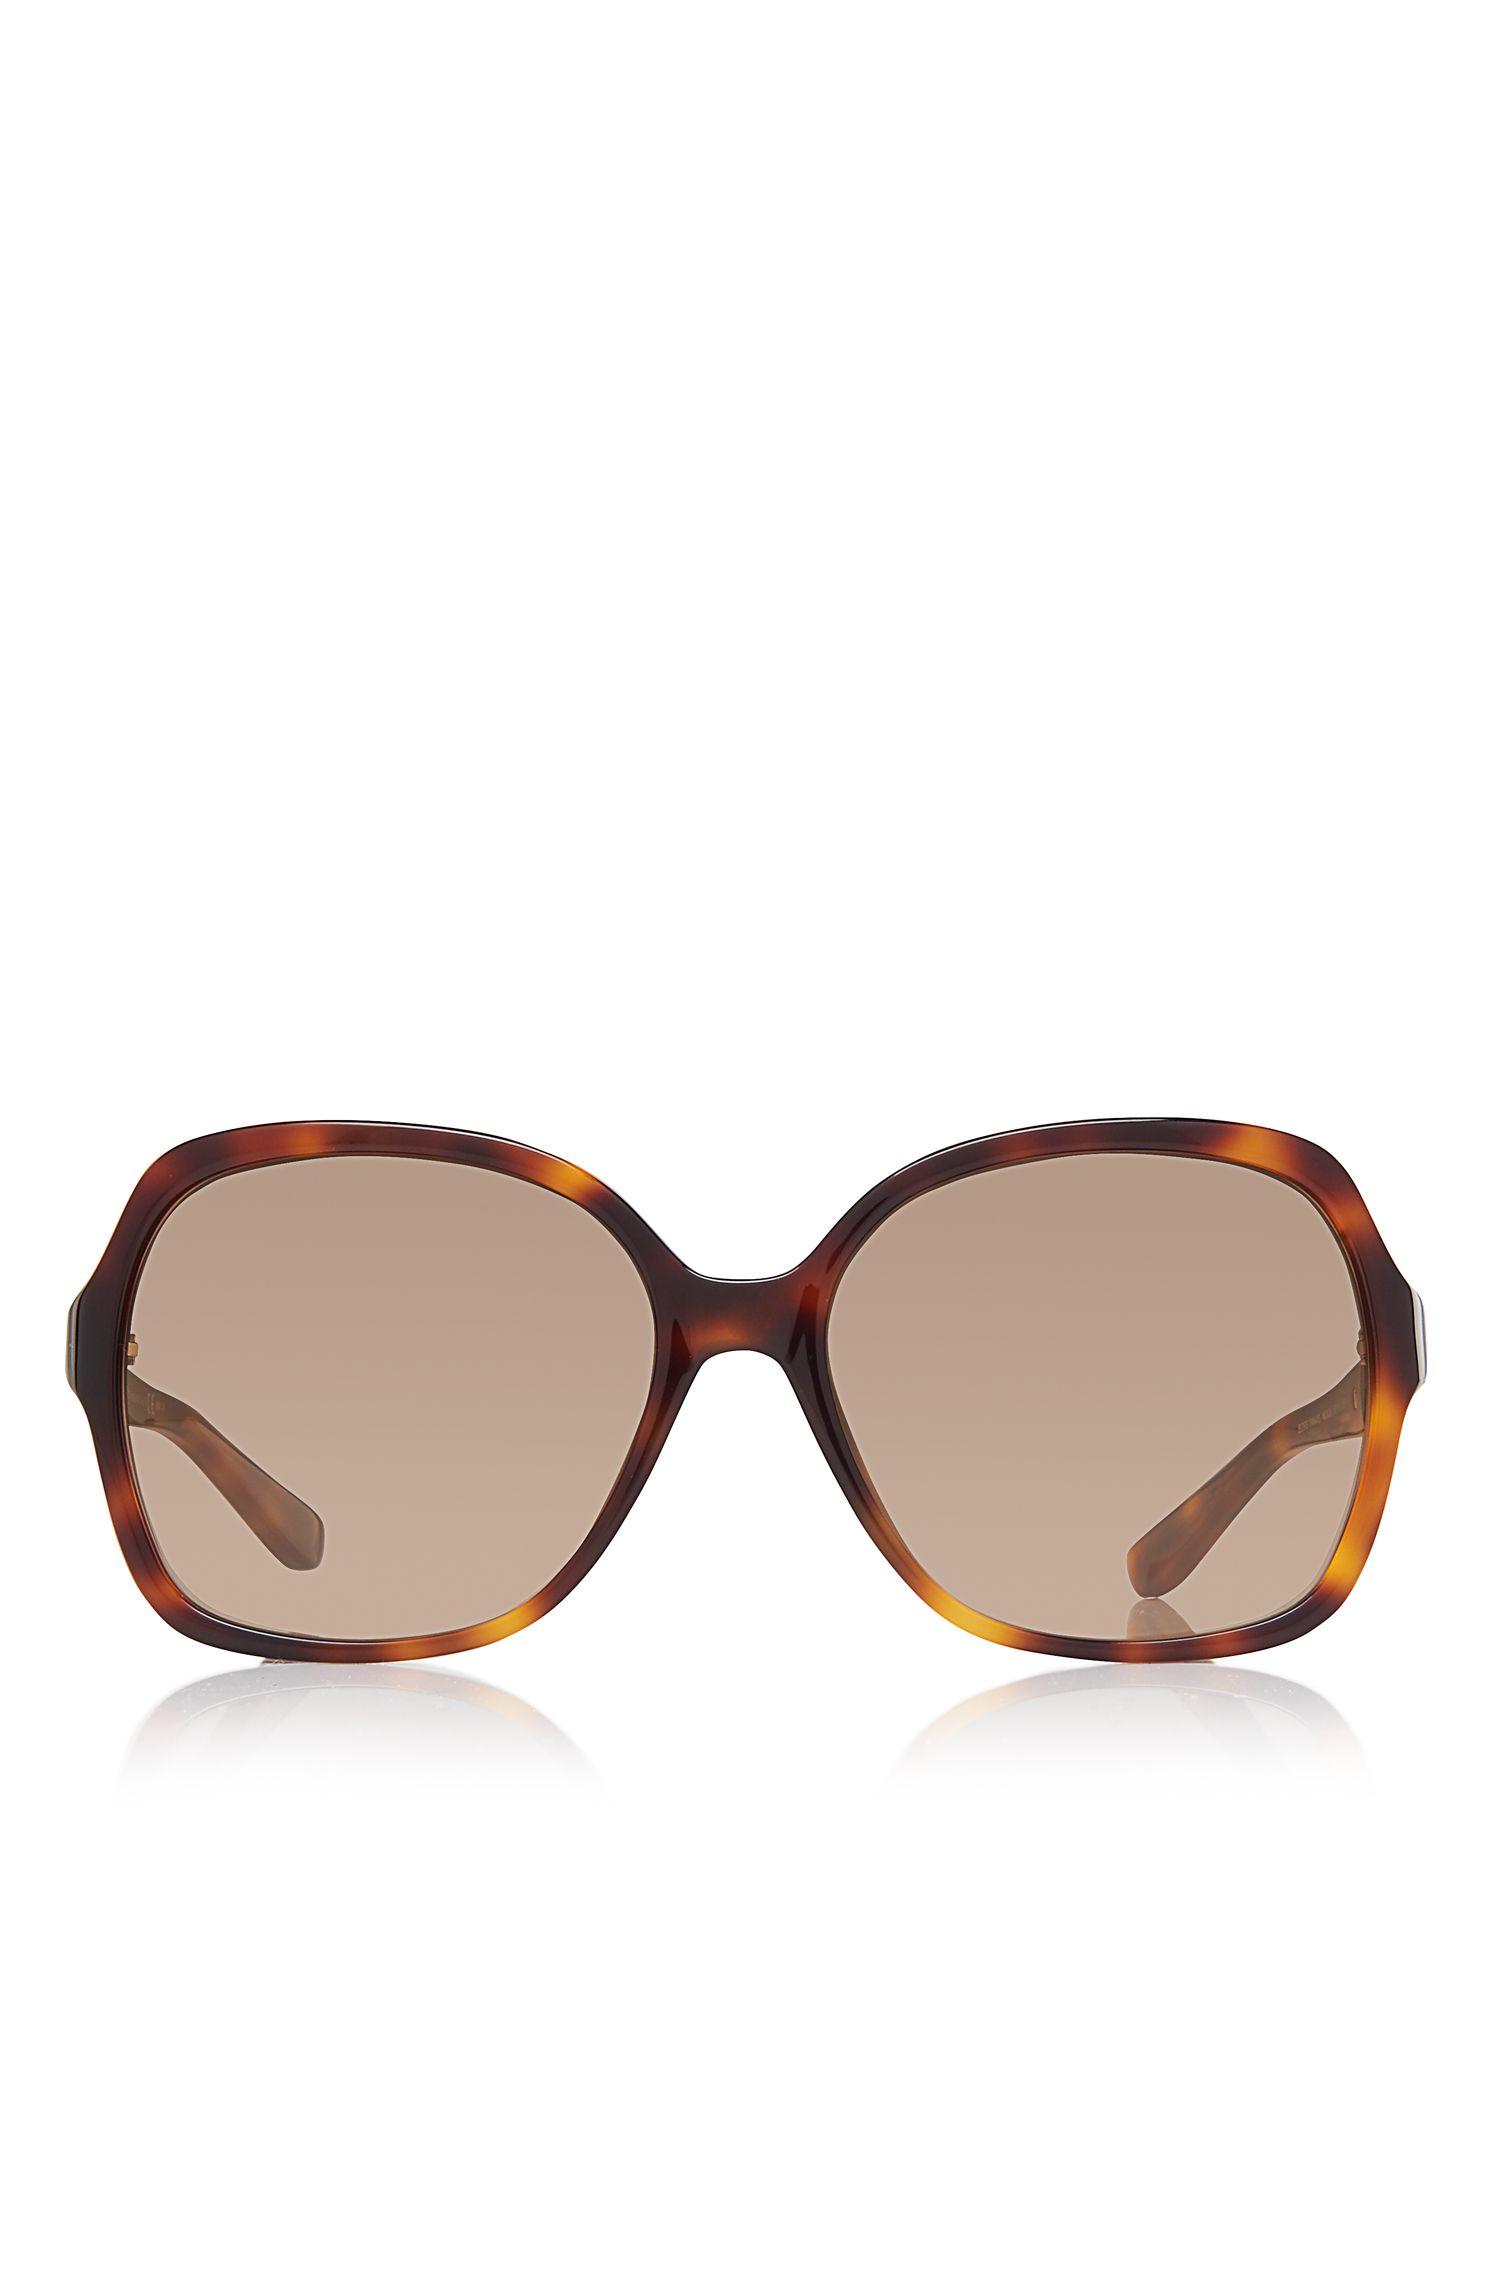 Square Tortoiseshell Pattern Sunglasses | BOSS 0664/S